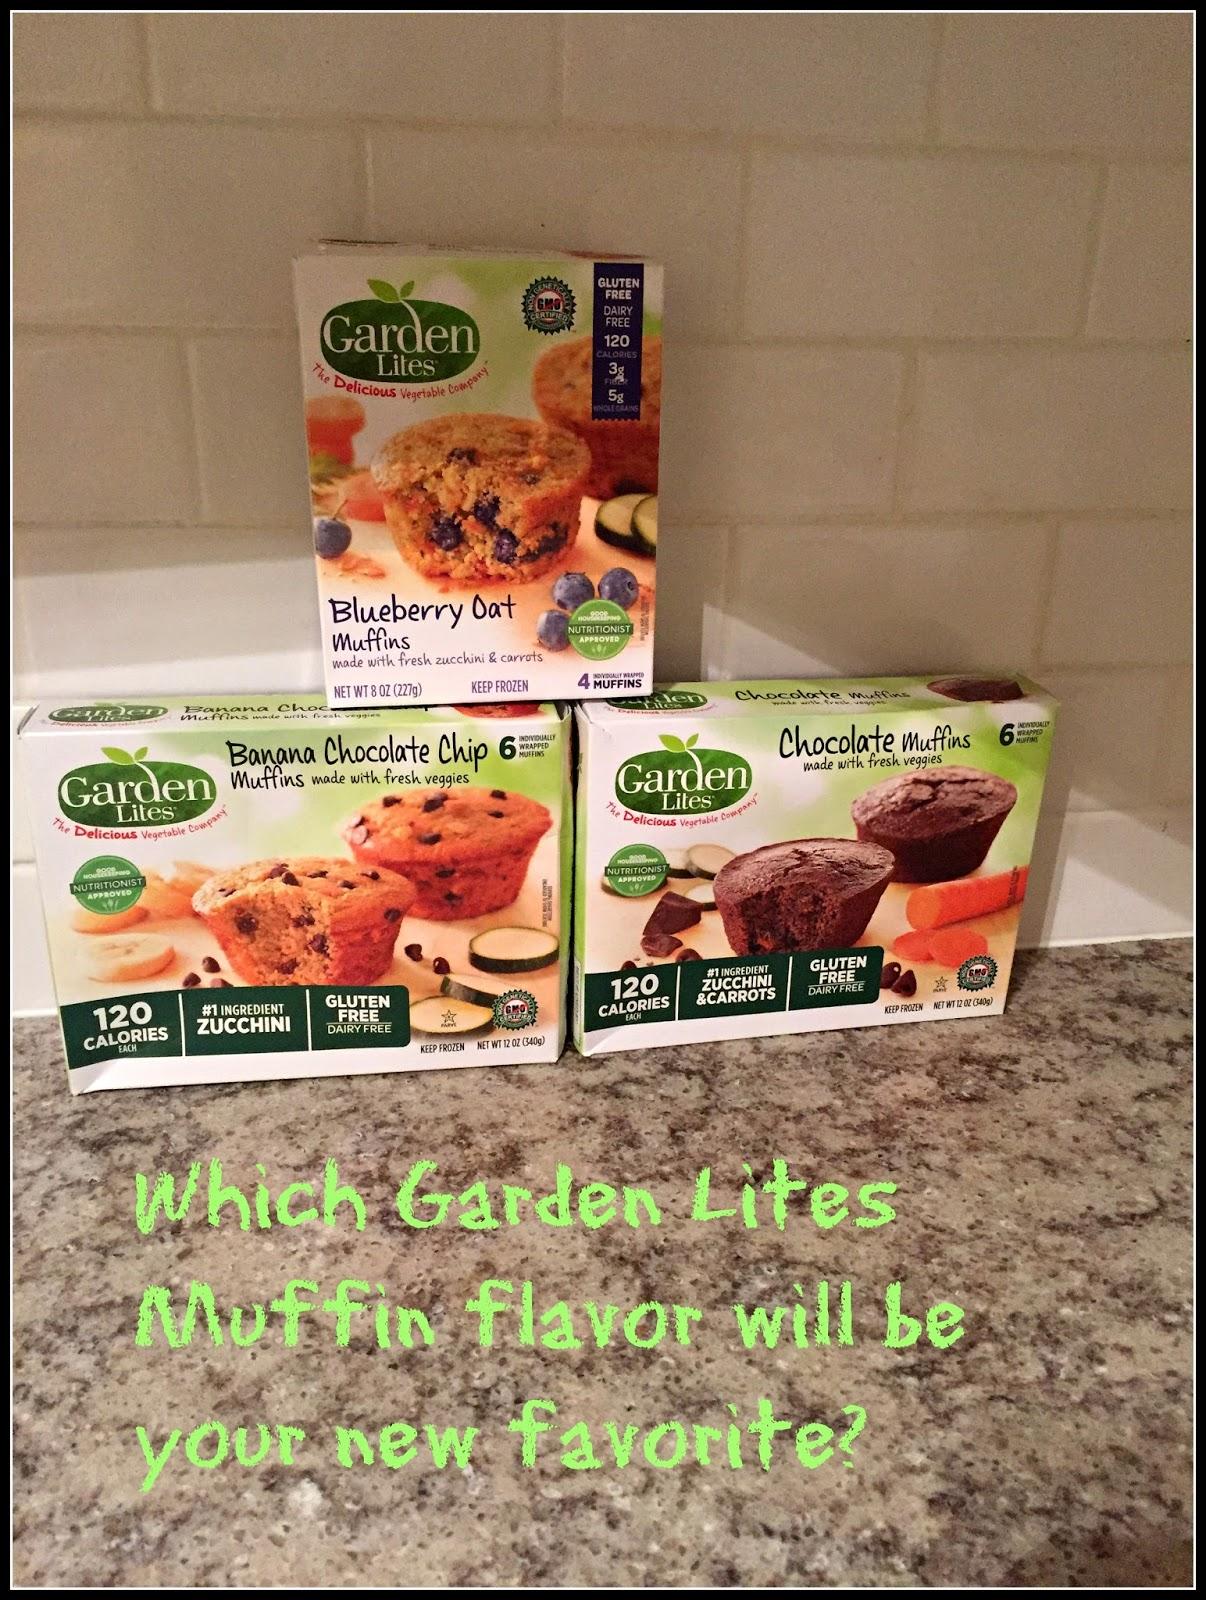 Sammi 39 s blog of life - Garden lites blueberry oat muffins ...